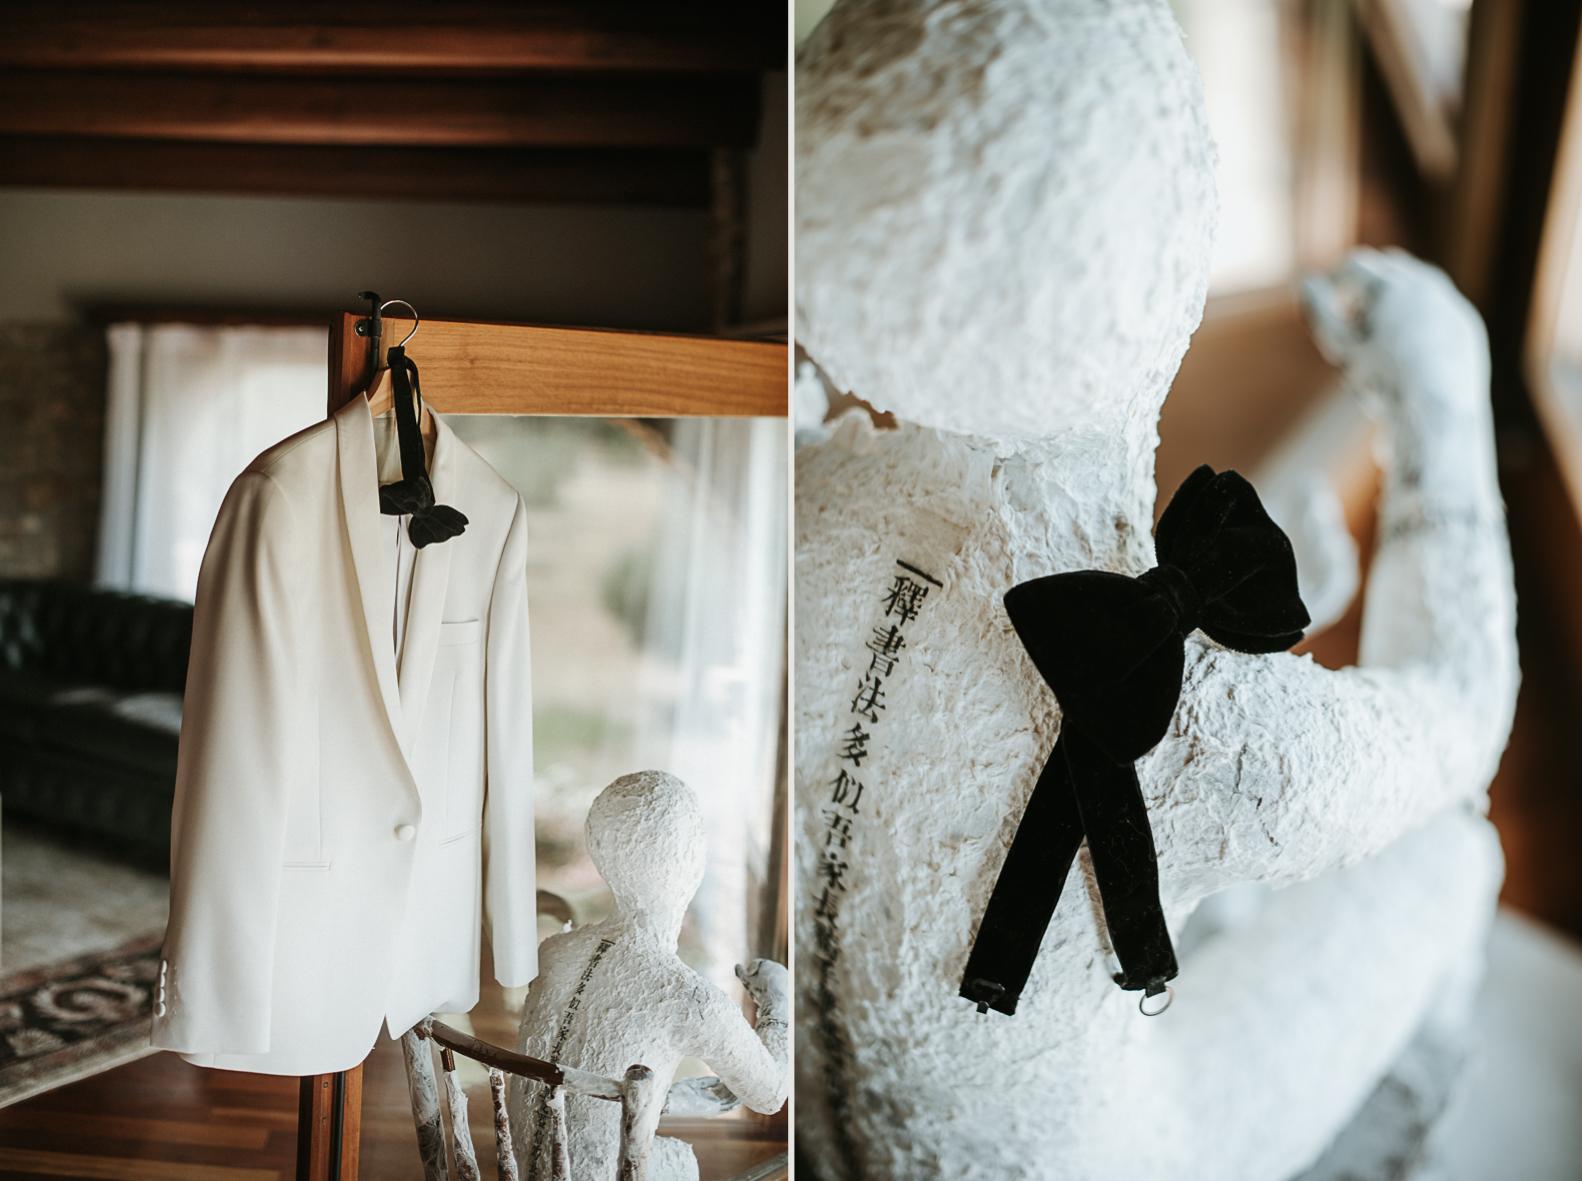 miks-sels-mas-terrats-girona-wedding-photographer-18.1